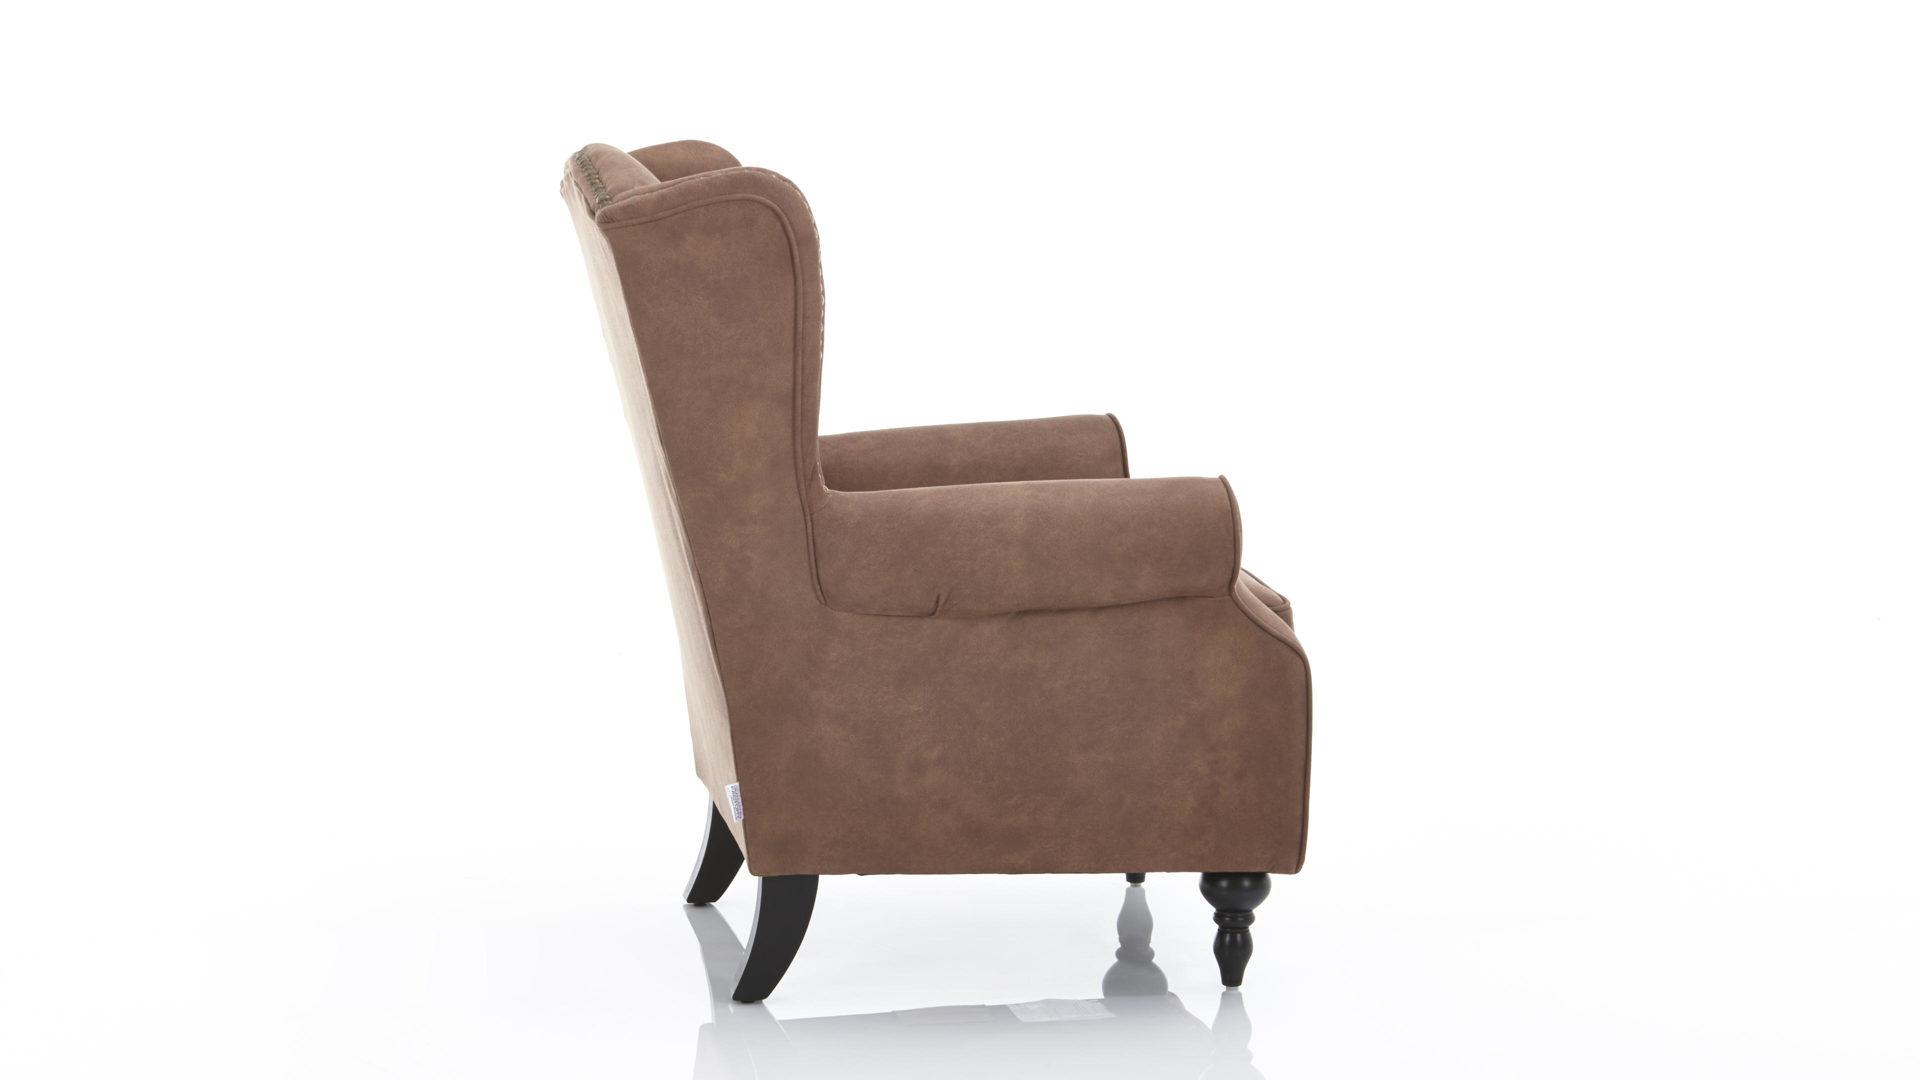 Ohrensessel modern günstig  Möbel Eilers Apen | Möbel A-Z | Sessel + Hocker | Ledersessel ...